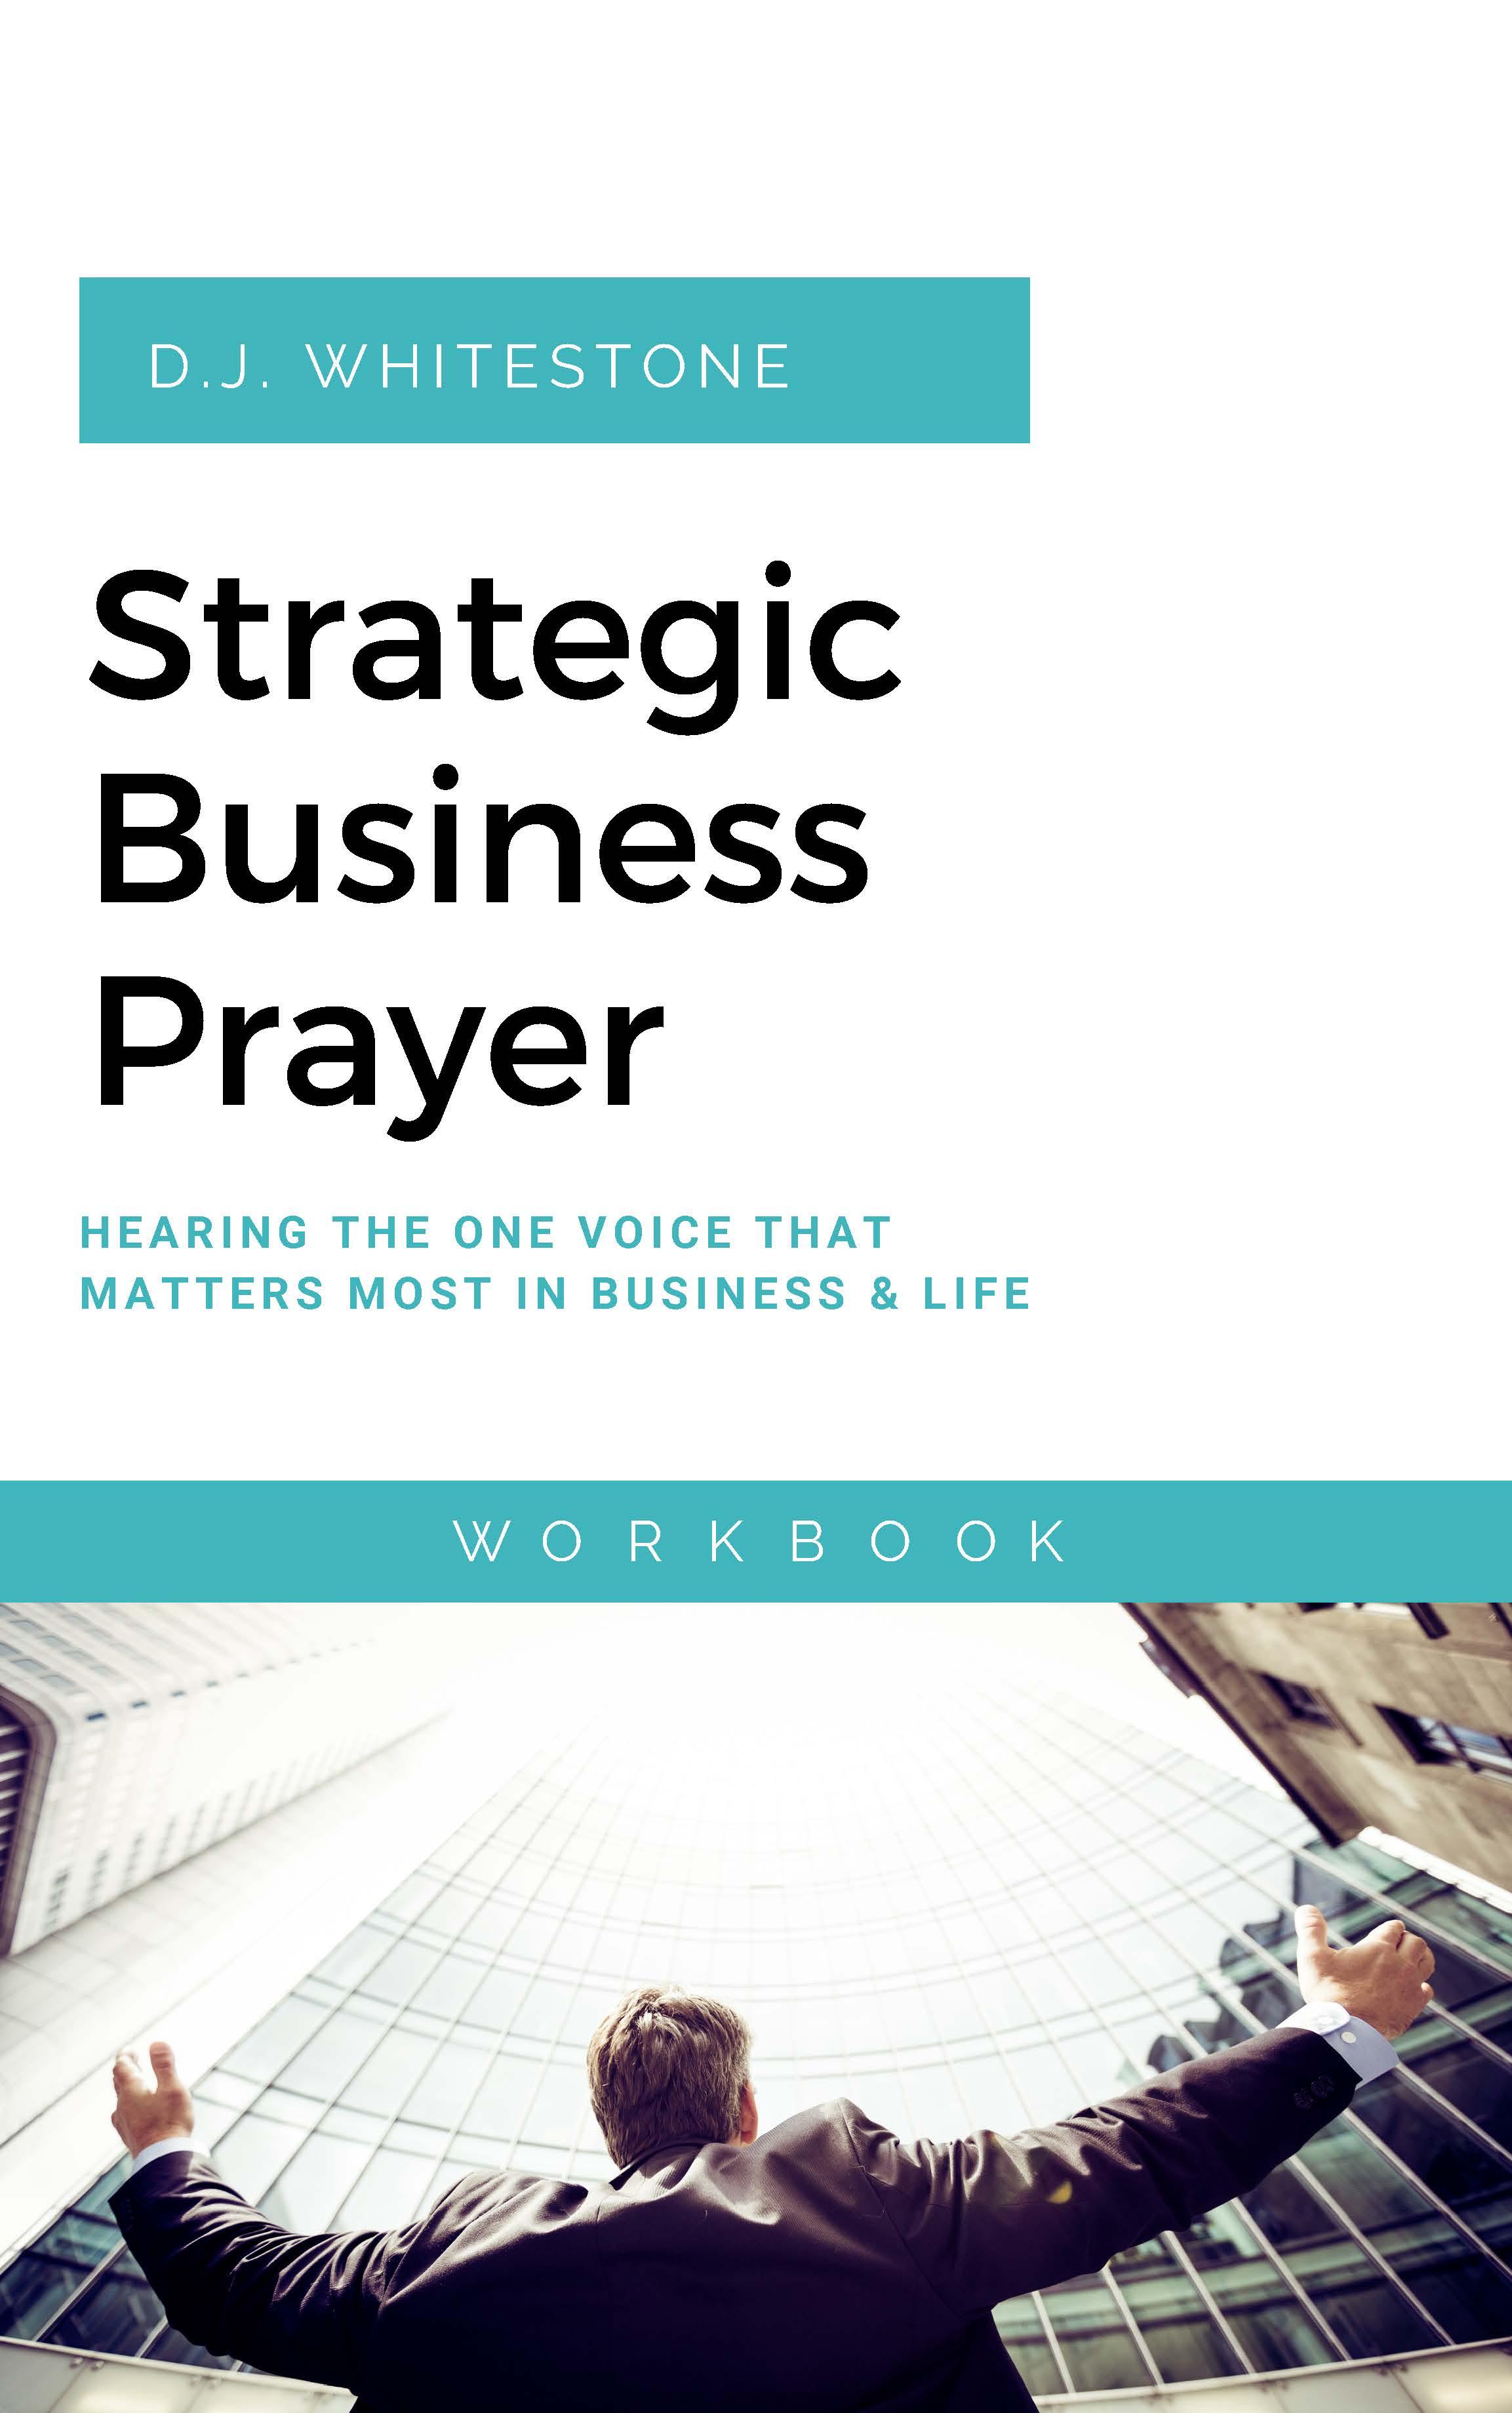 Strategic Business Prayer